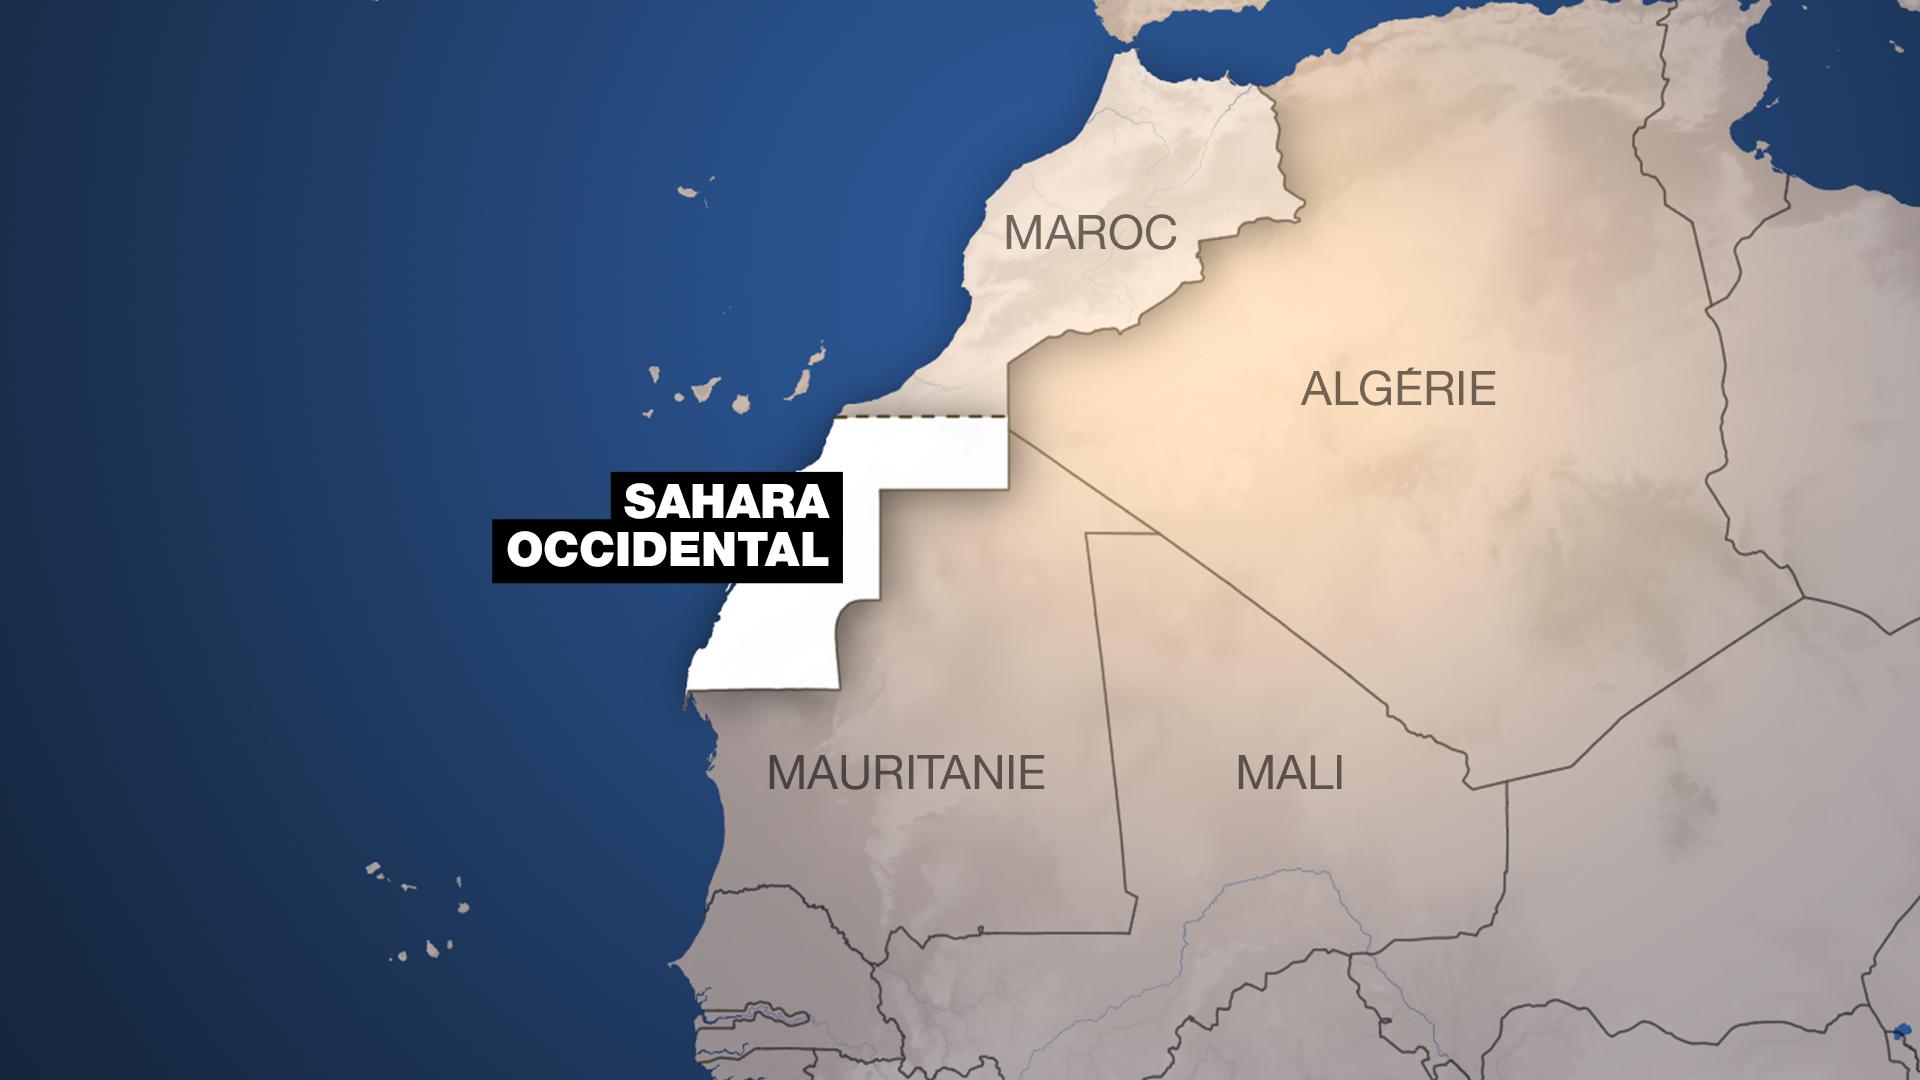 存檔圖片:西撒哈拉及其相鄰國家 Image d'archive: Le Sahara occidental et ses voisins.